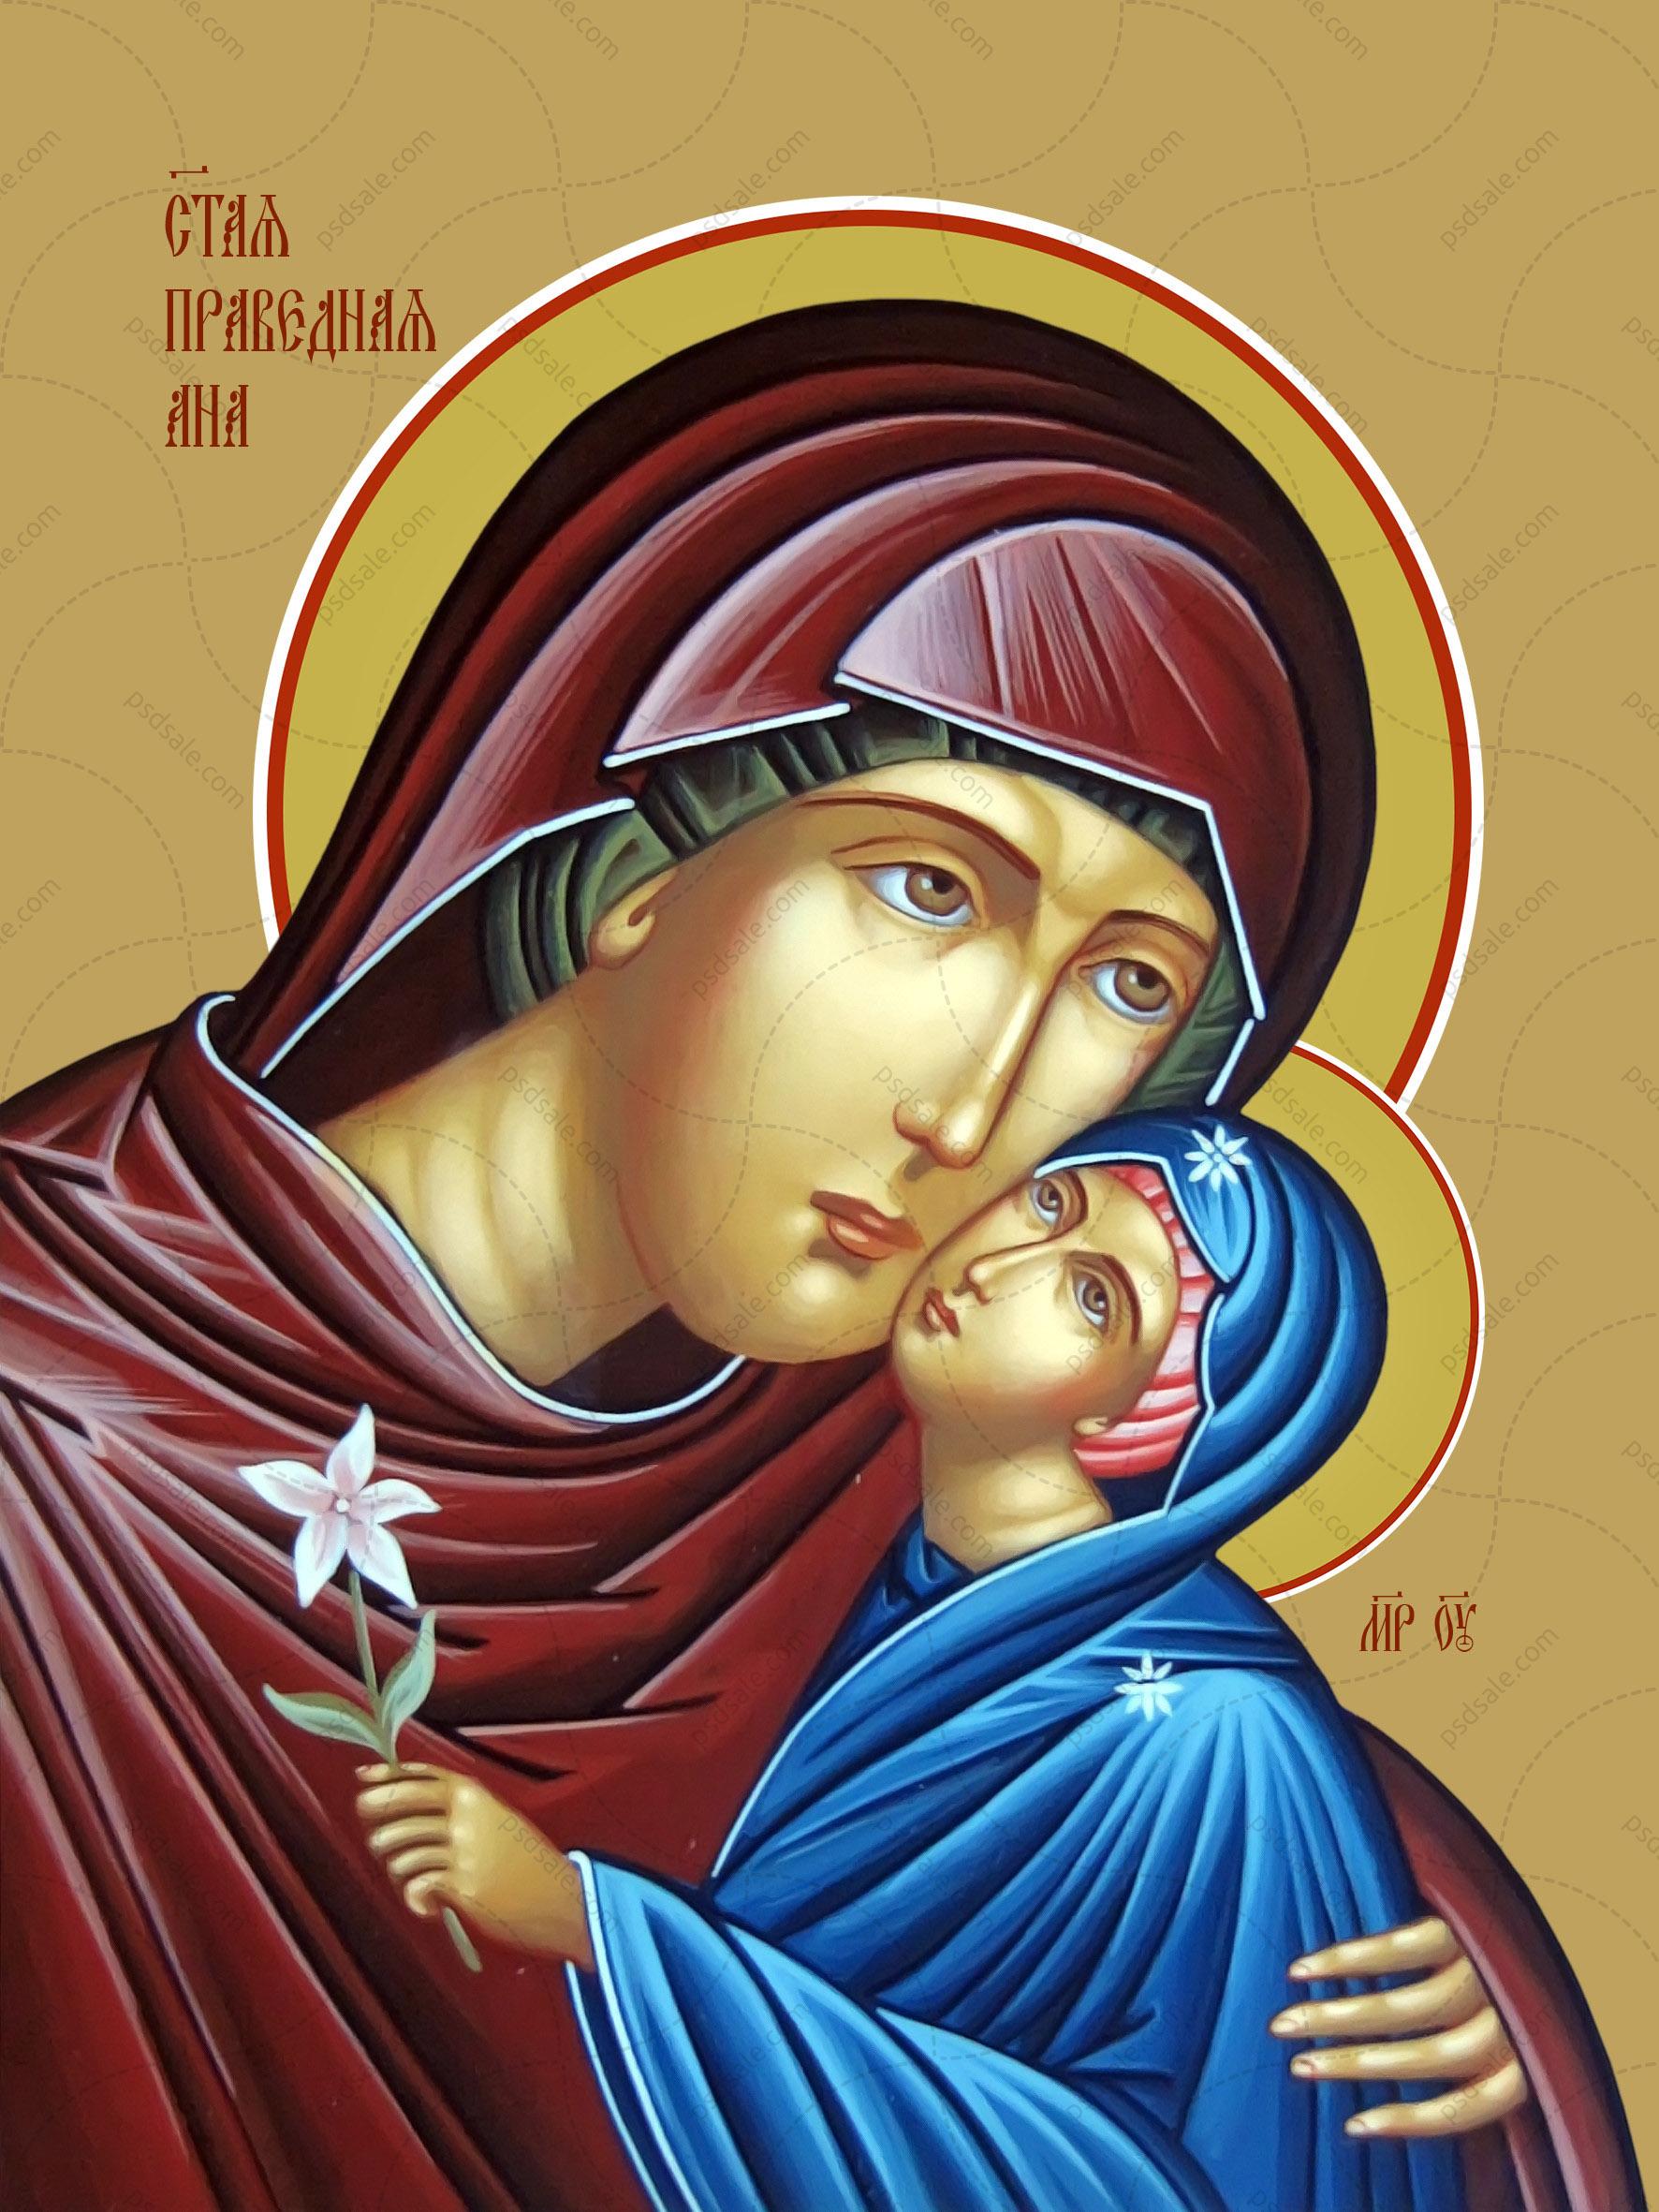 Анна Праведная, святая